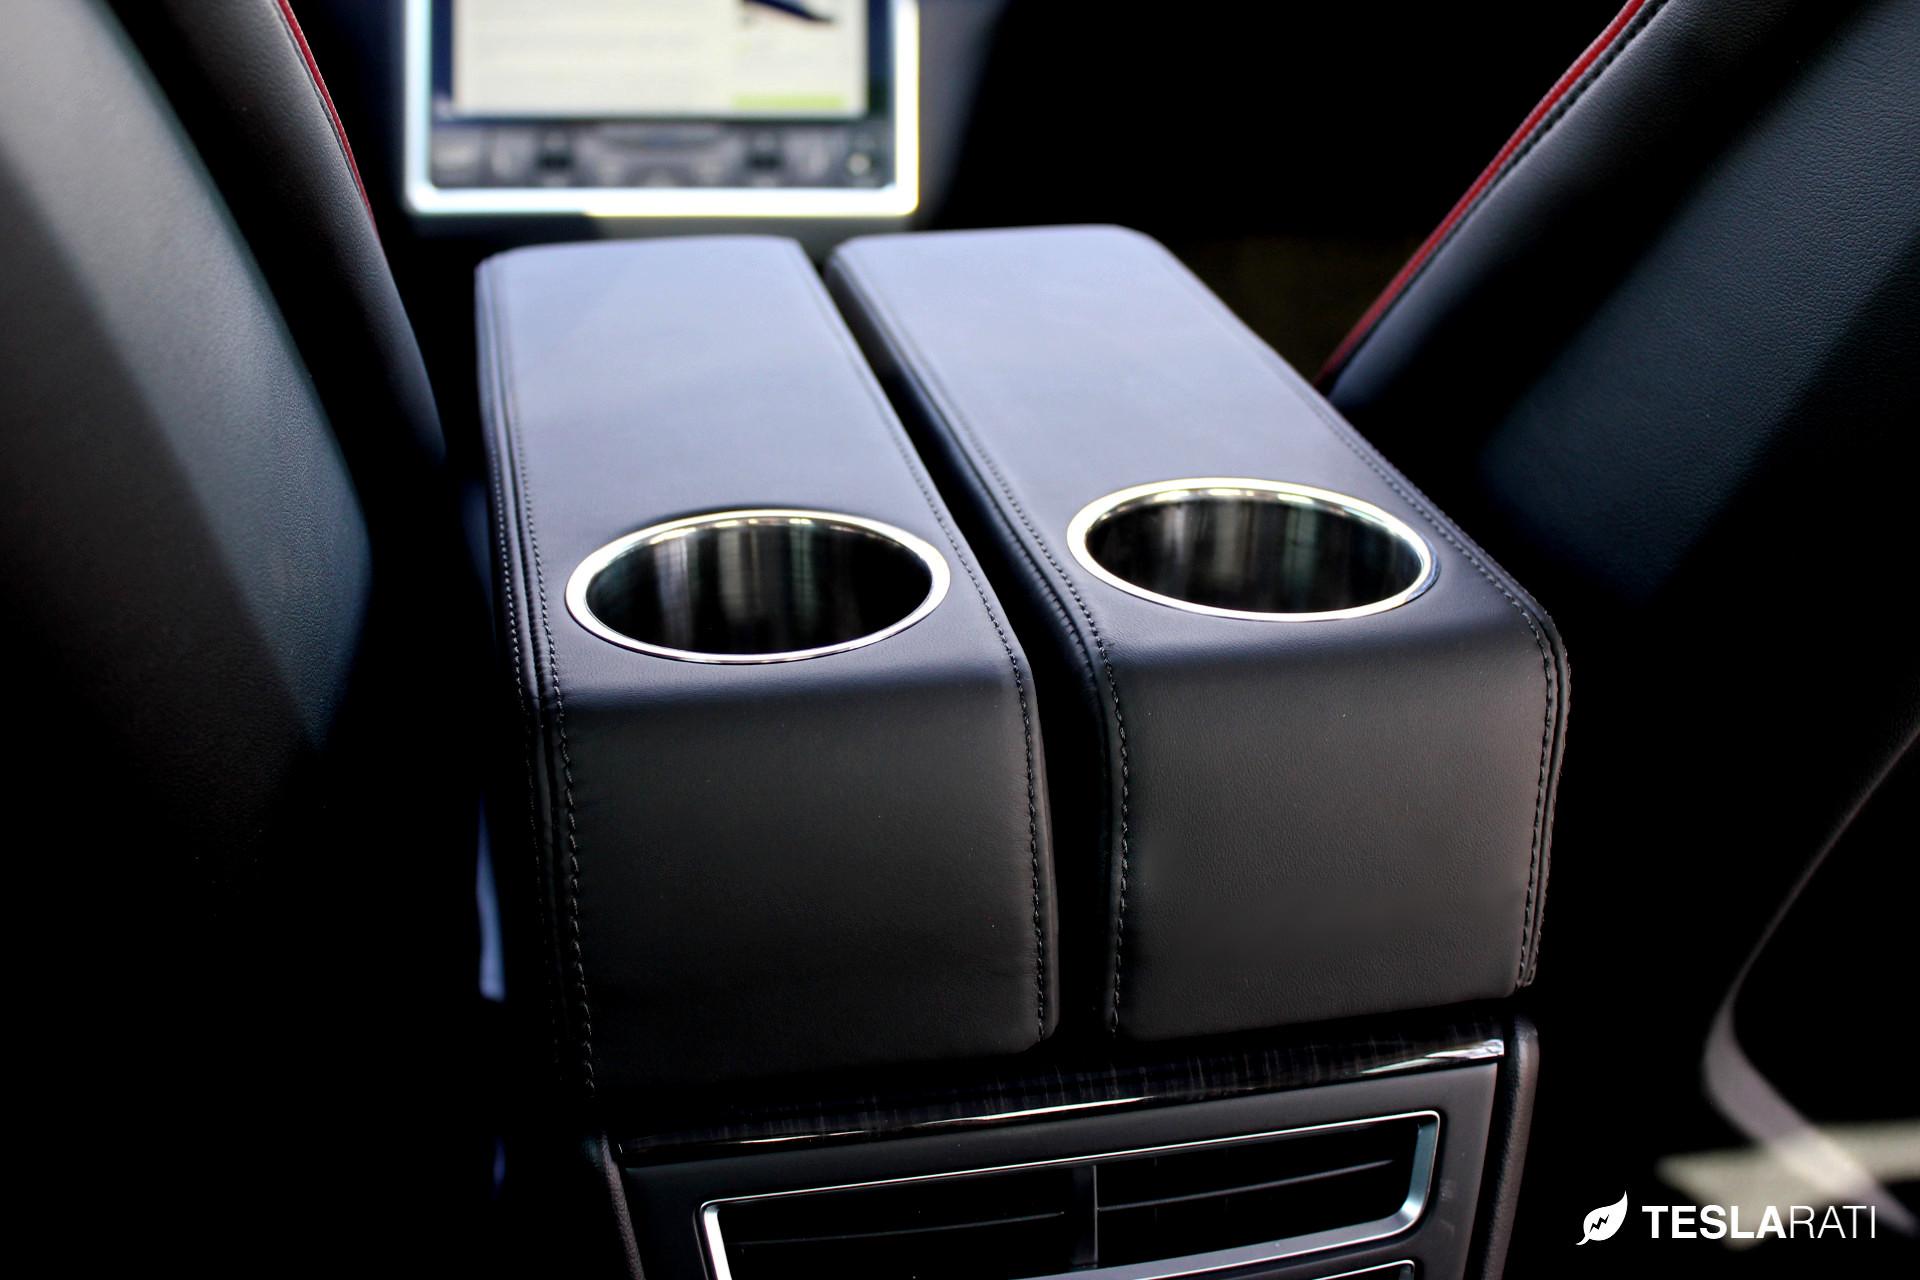 PARZ_Tesla_Rear_Seat_Cup_Holders_10